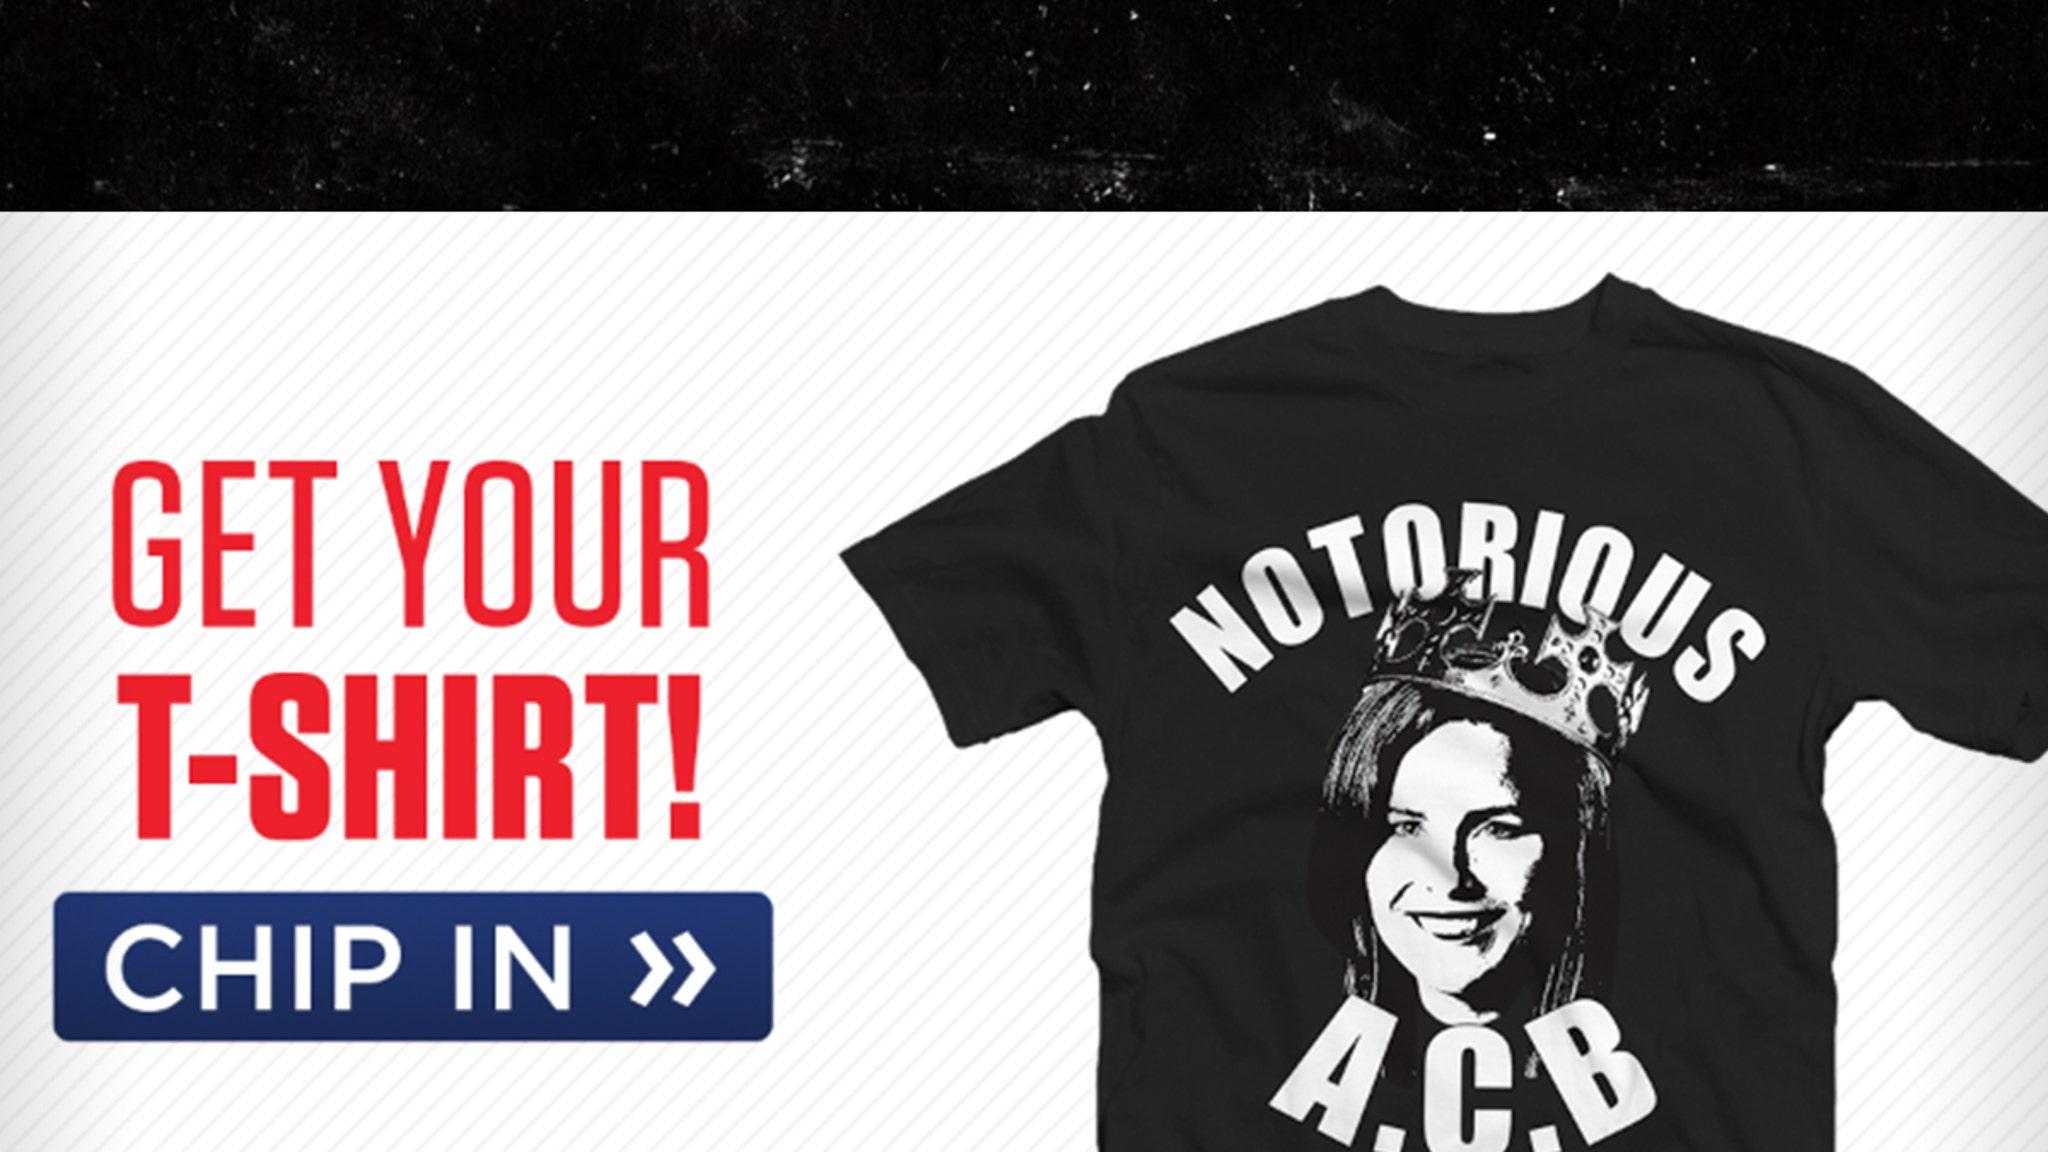 Republicans Sell 'Notorious A.C.B.' T-Shirts Supporting Amy Coney Barrett -  WorldNewsEra